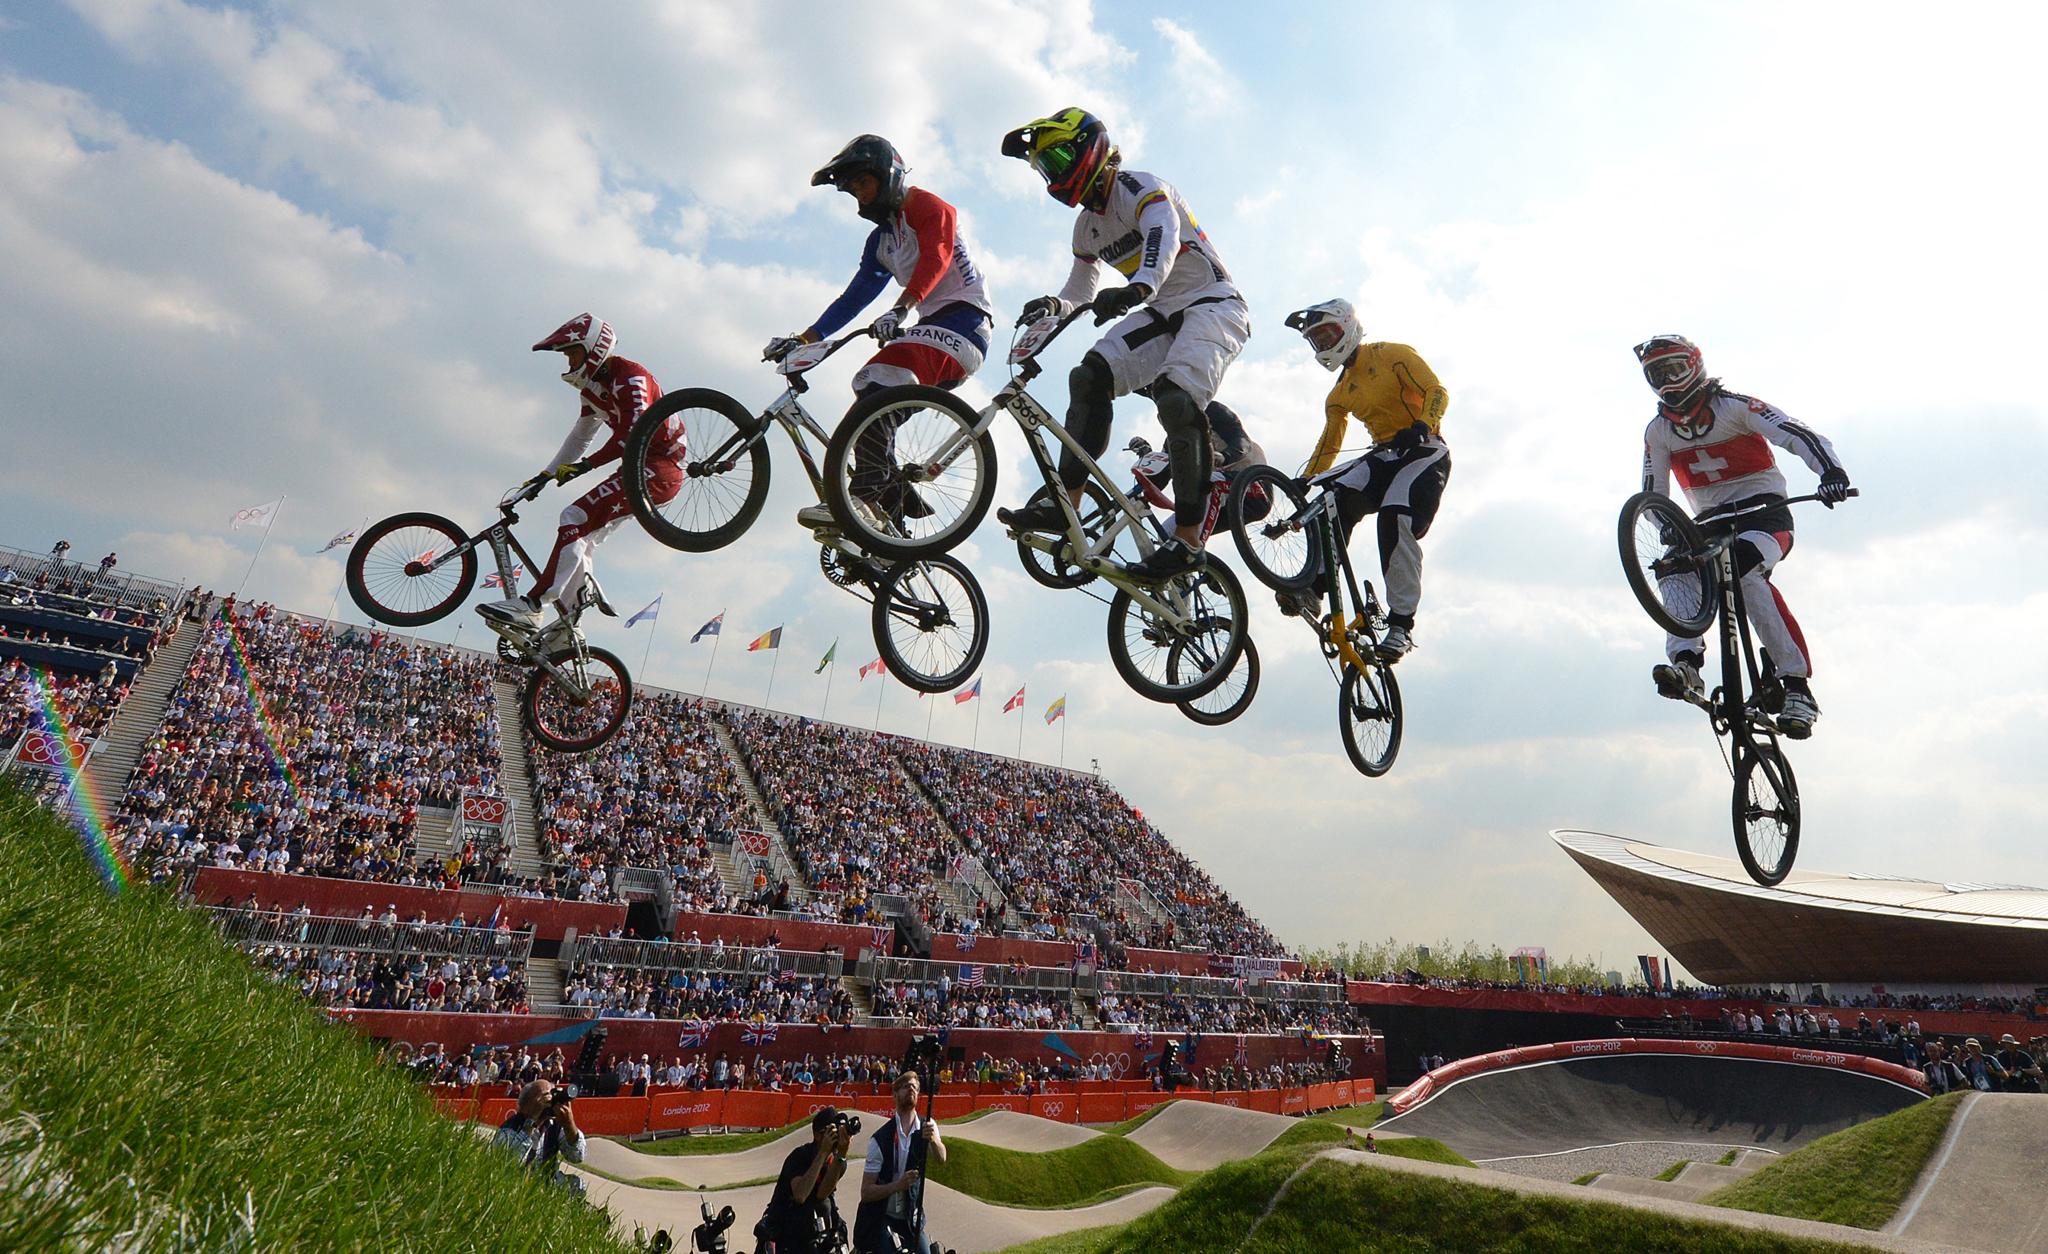 /photo/2012/0810/as_bmx_olympic3_2048.jpg